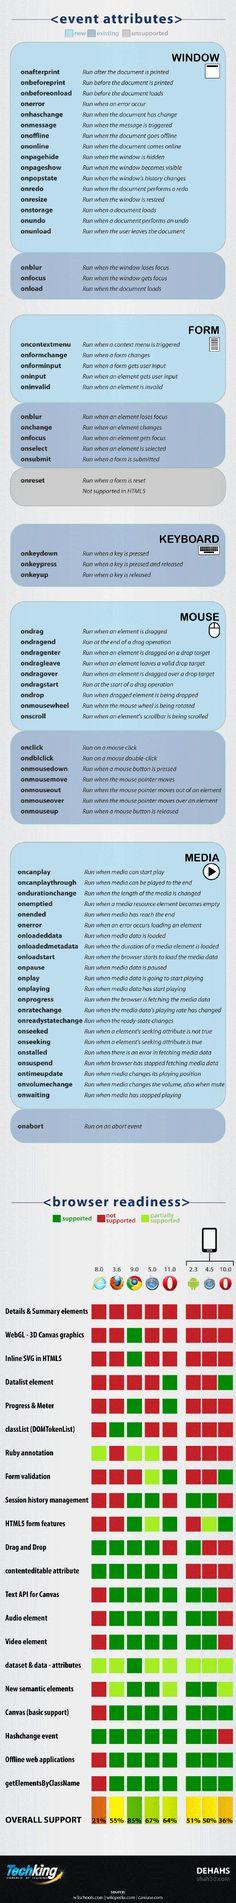 Ultimate HTML 5 Cheatsheet Page